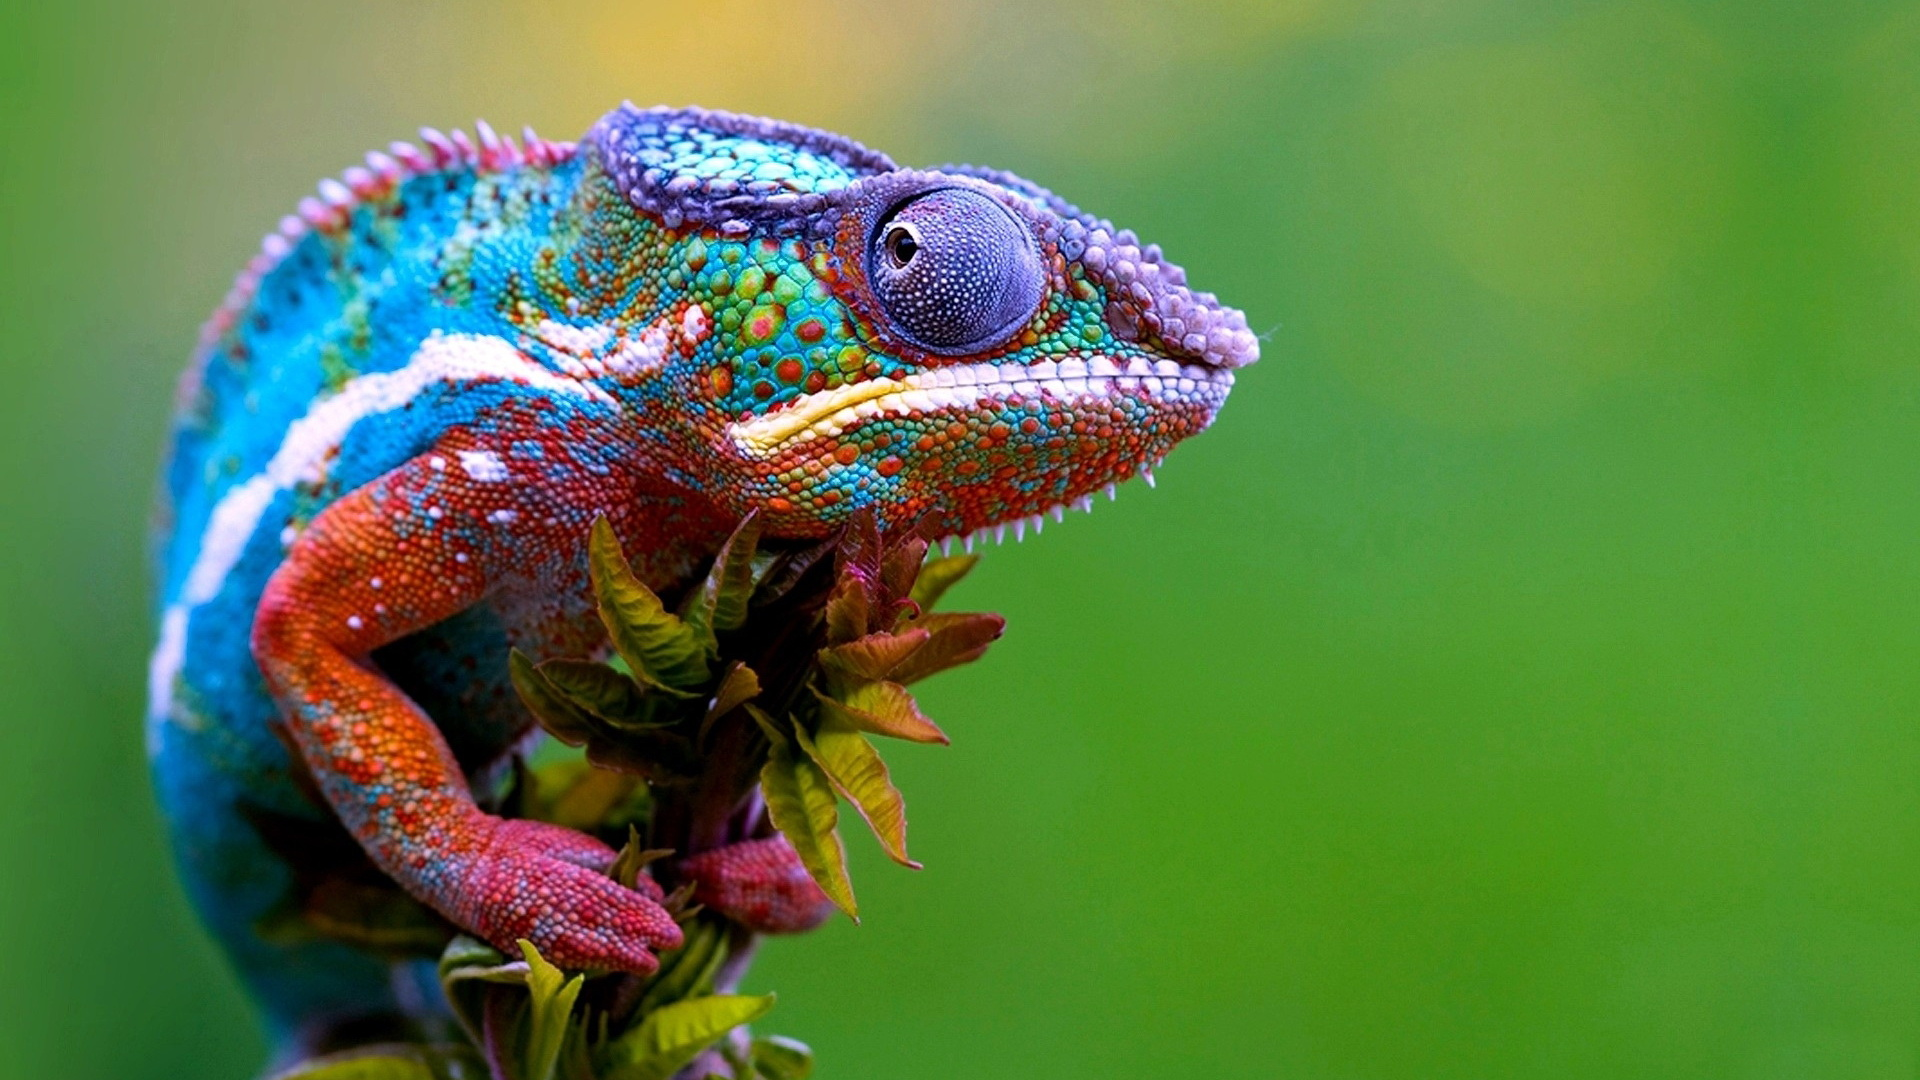 Chameleon Lizard Pictures